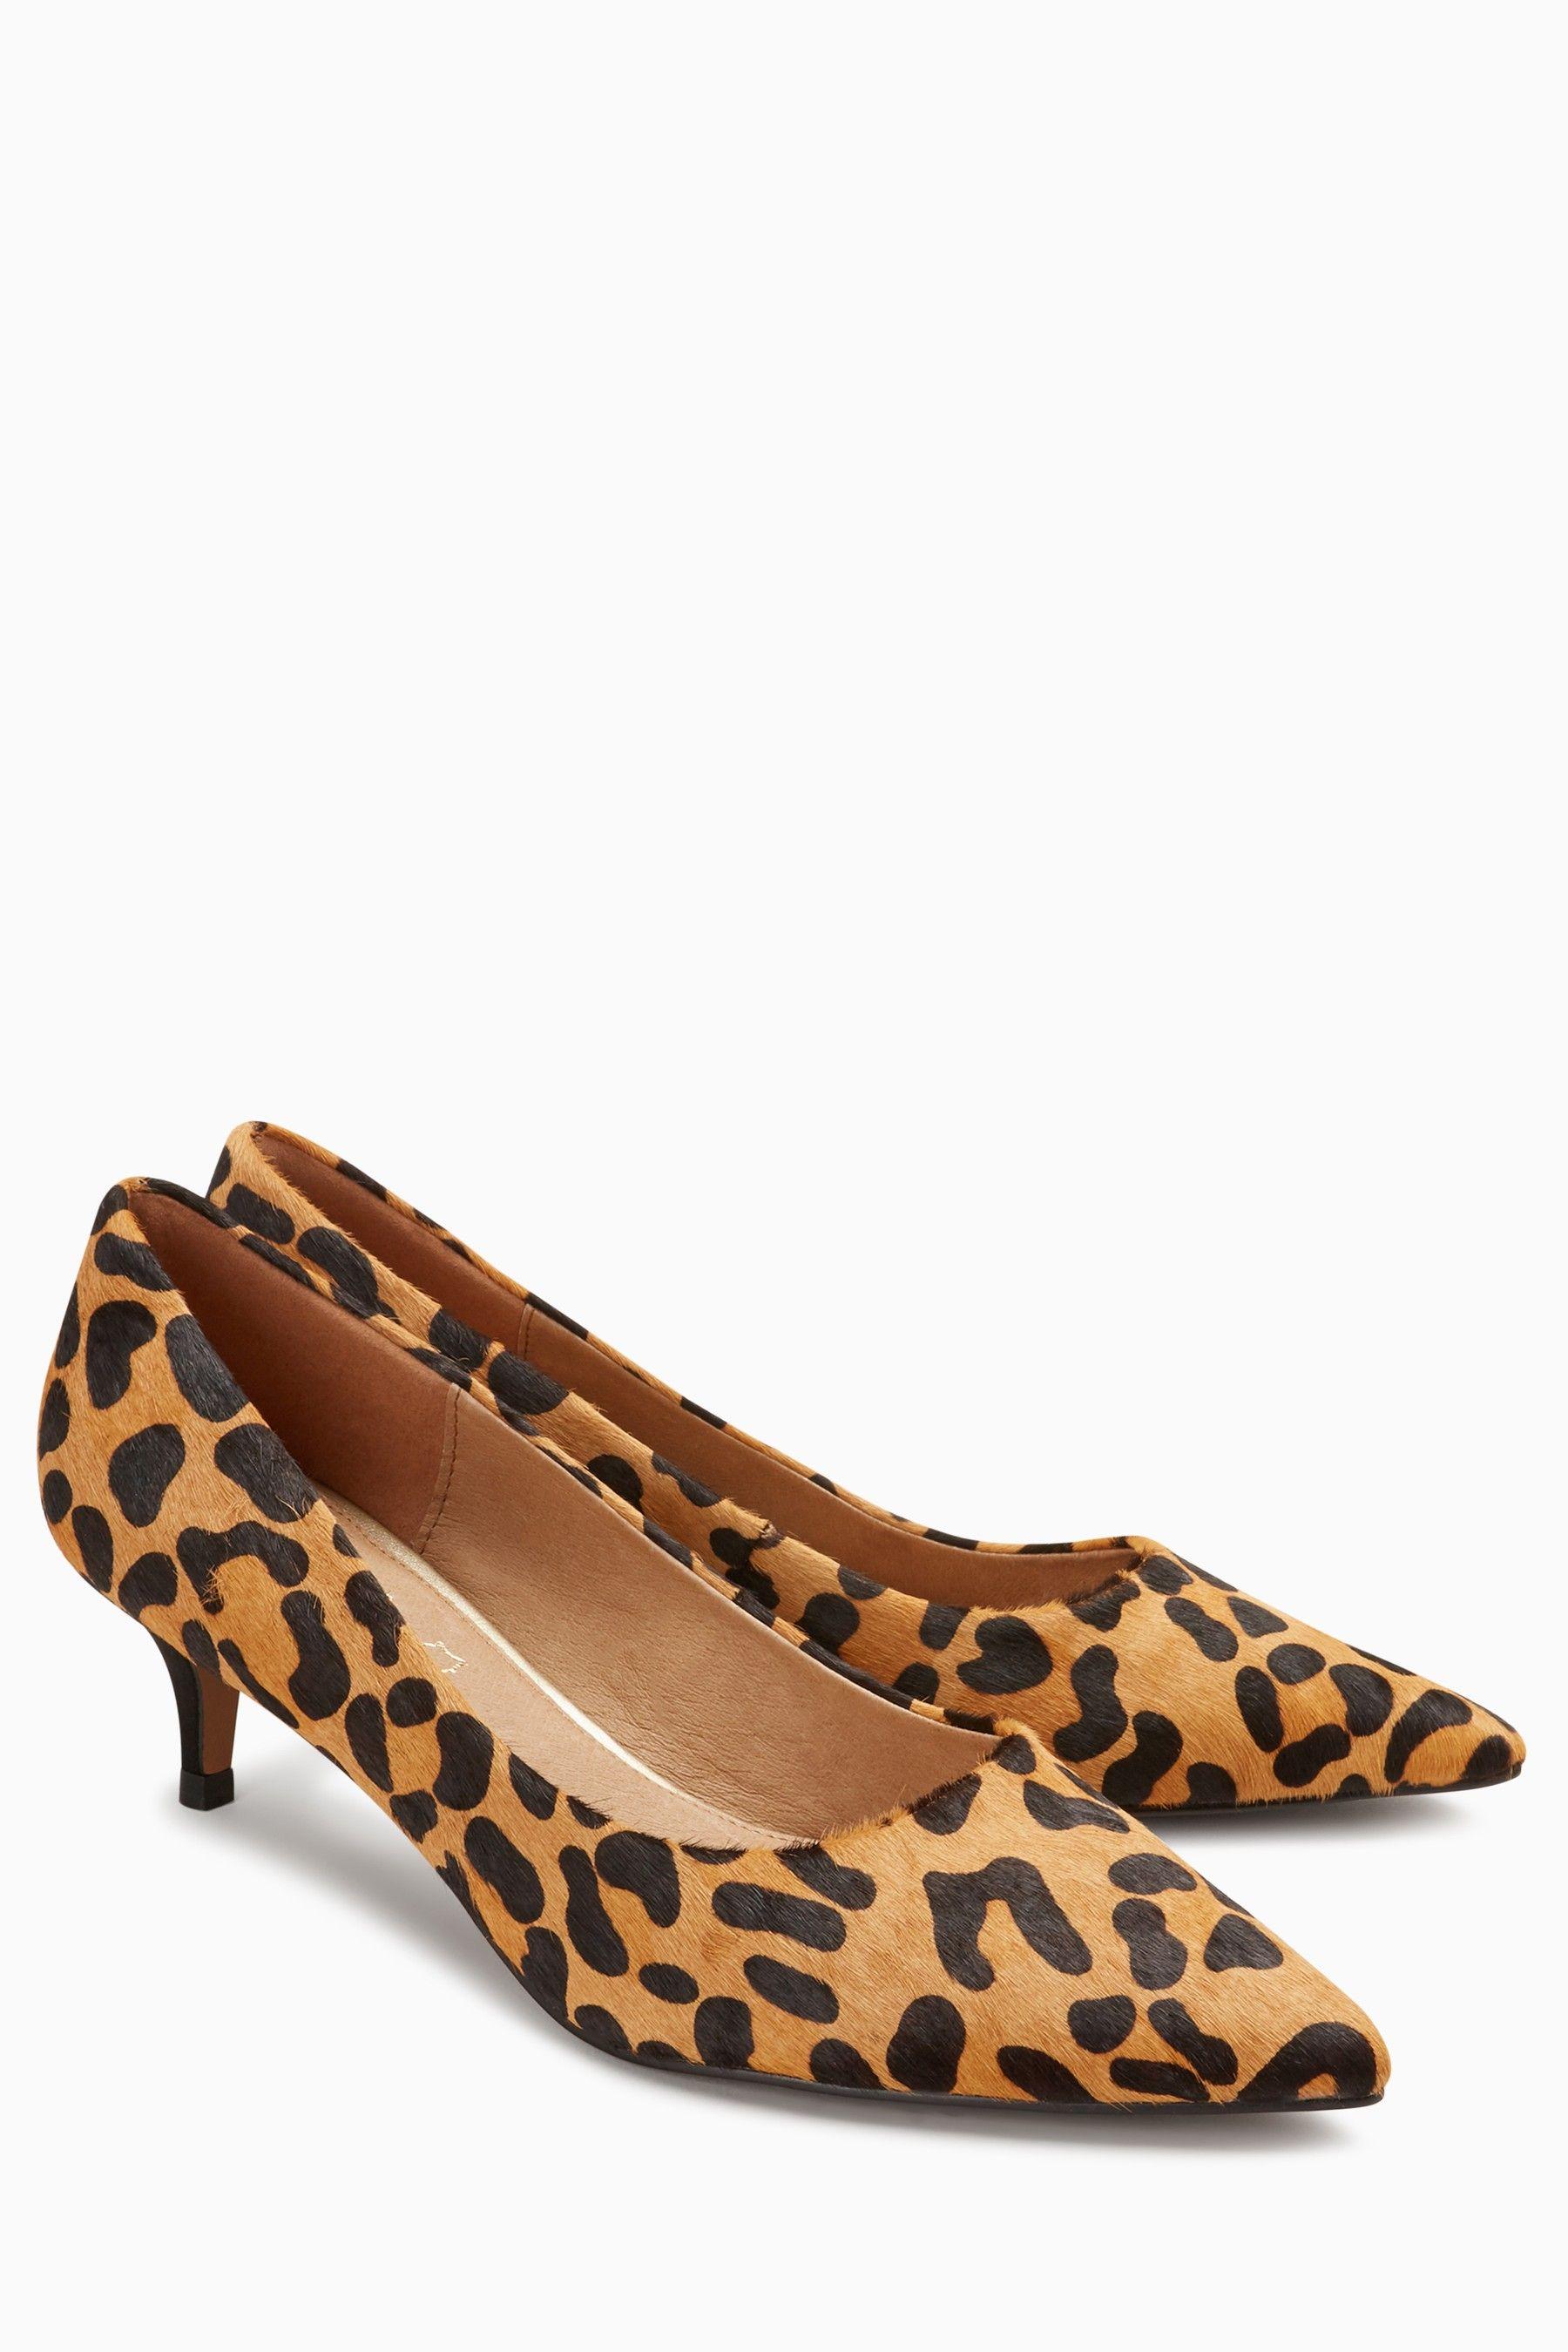 Womens Next Leopard Kitten Heel Courts Animal Kitten Heels Black Kitten Heels Leopard Print Shoes